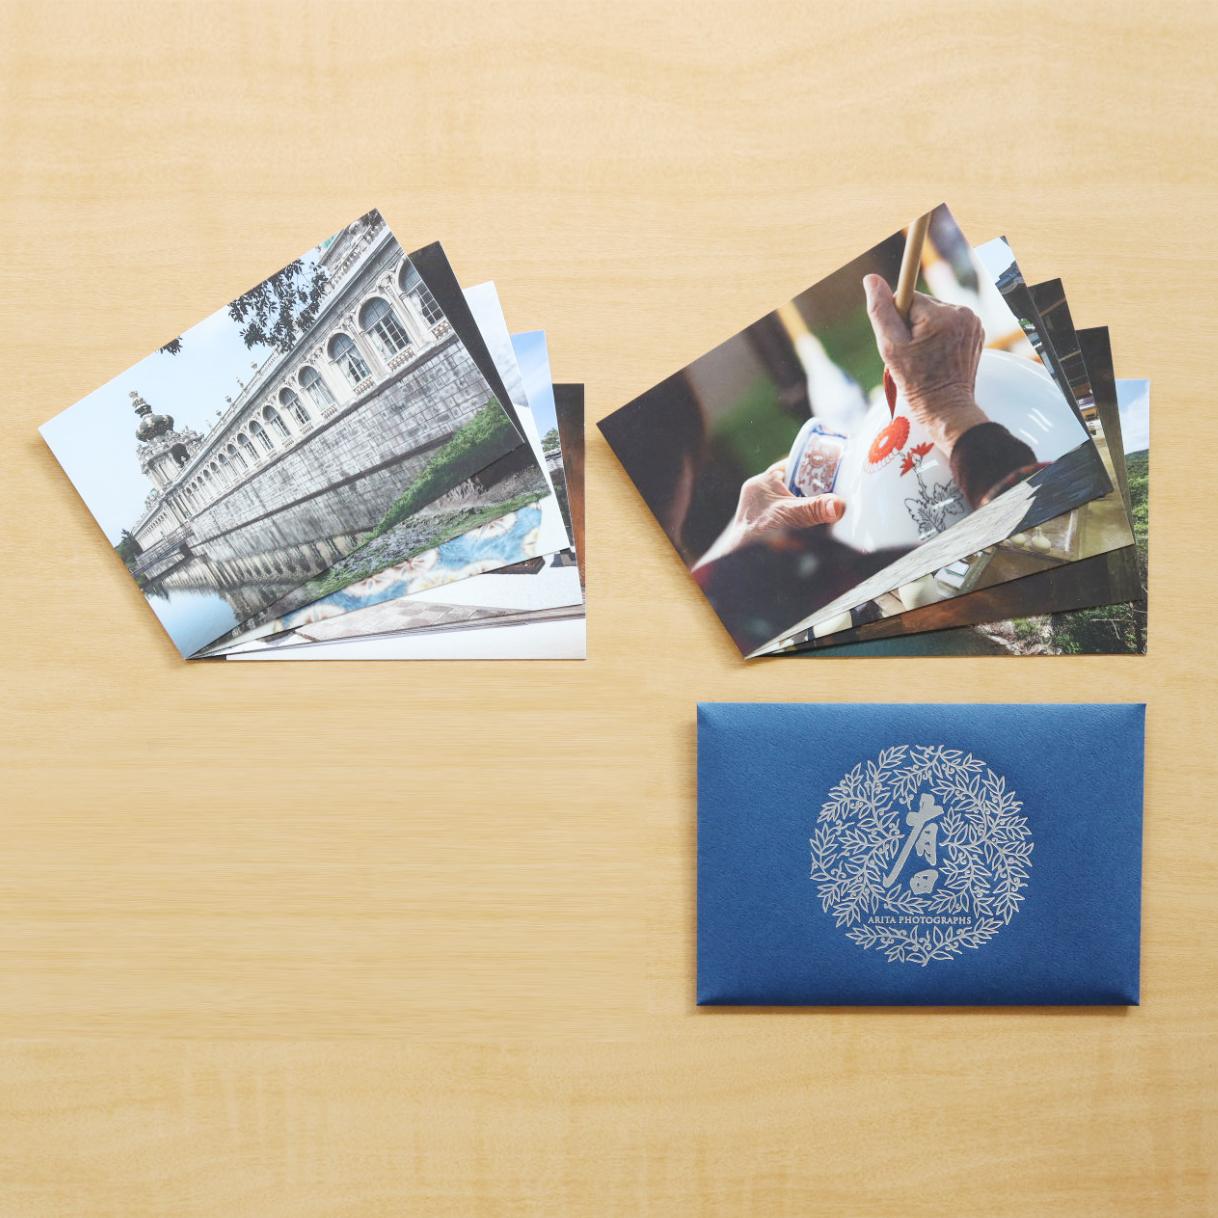 ARITA PHOTOGRAPHS ポストカード10枚セット【送料無料】